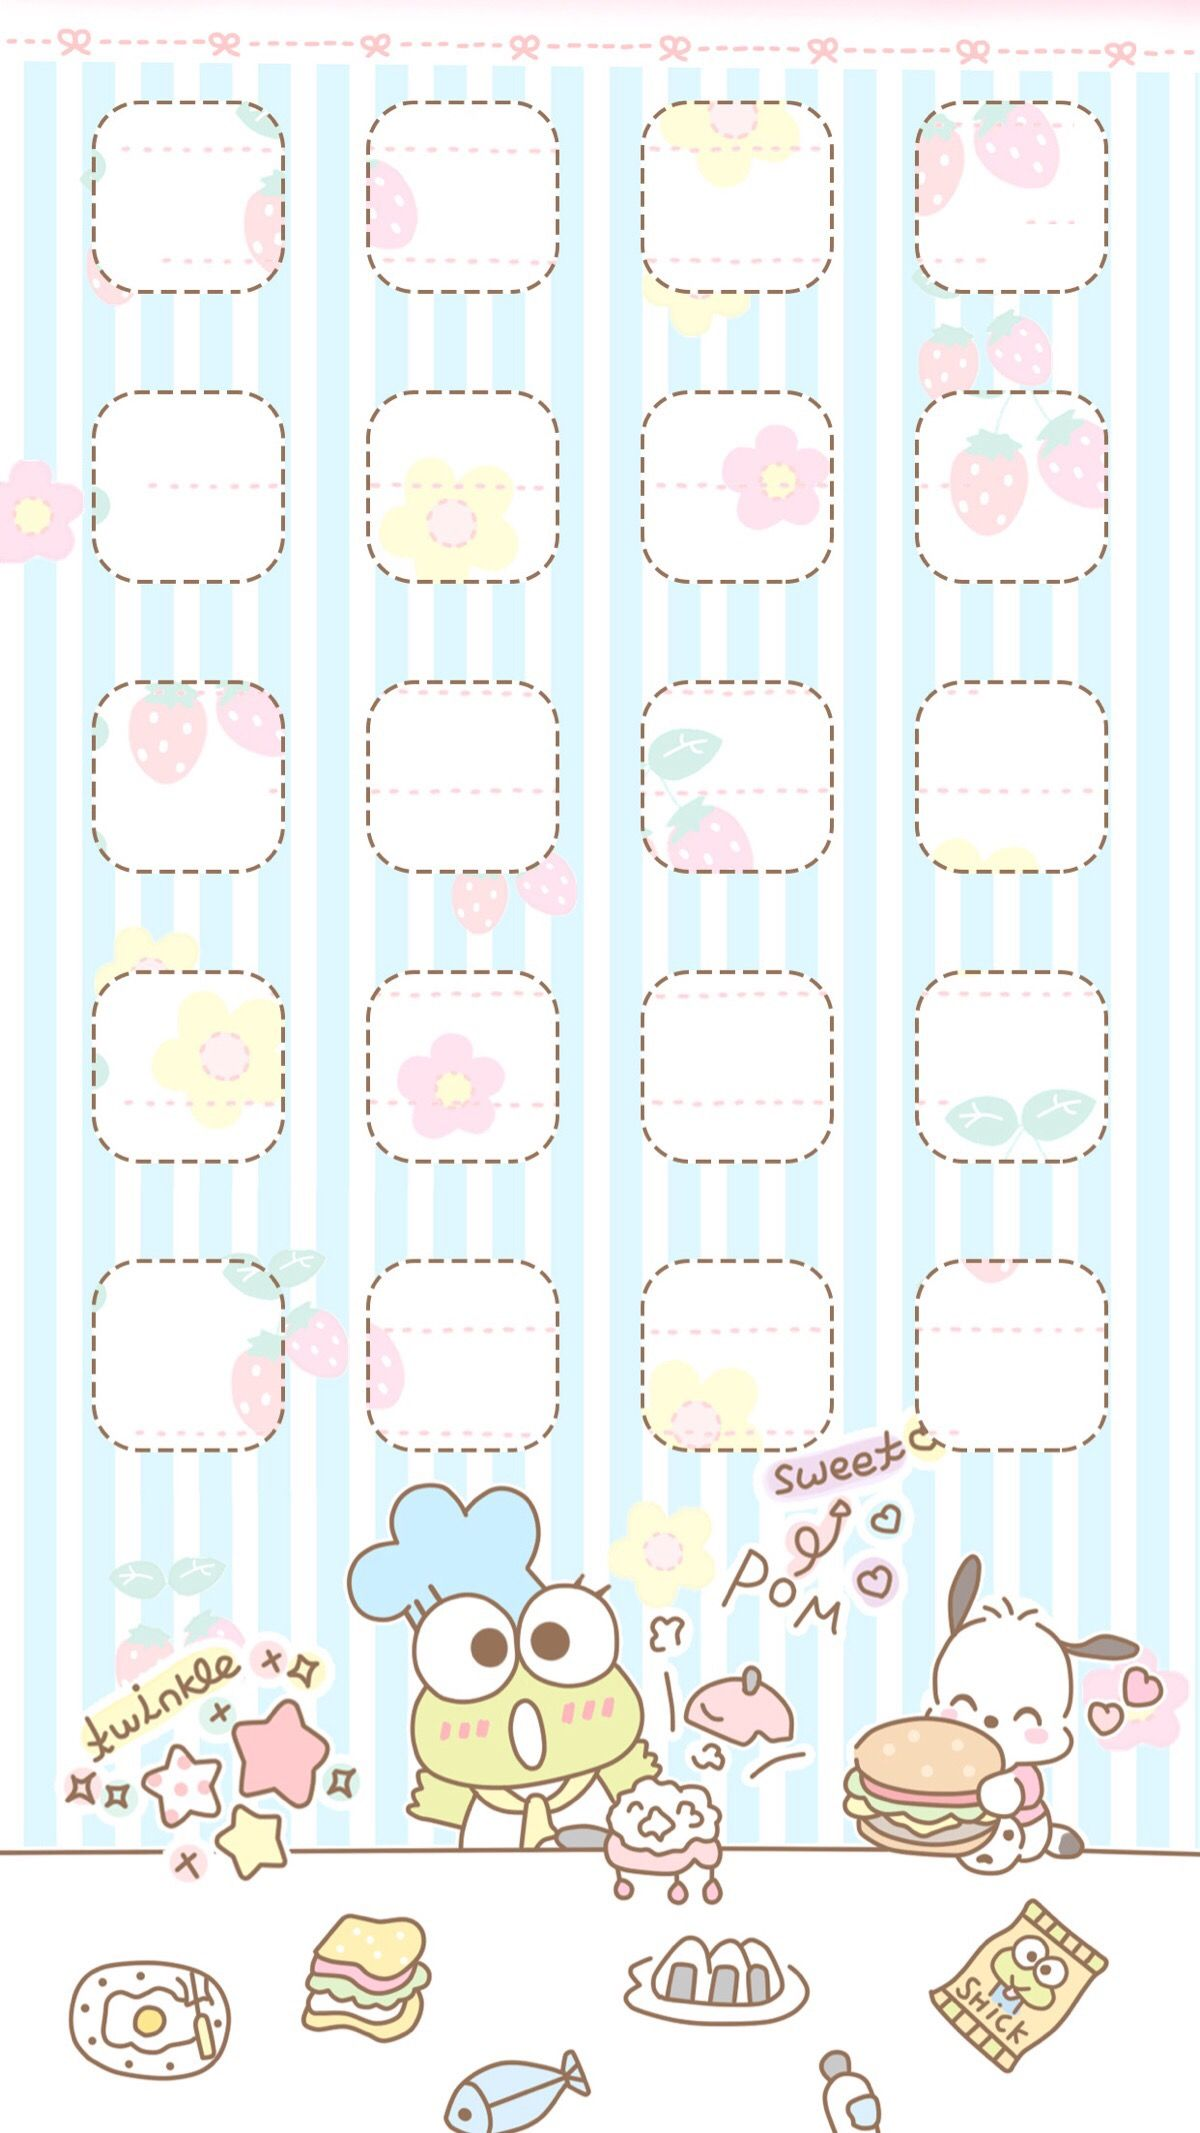 Pin By Viyoko Wai On Theme Wallpaper Iphone Iphone Wallpaper Girly Keroppi Wallpaper Sanrio Wallpaper